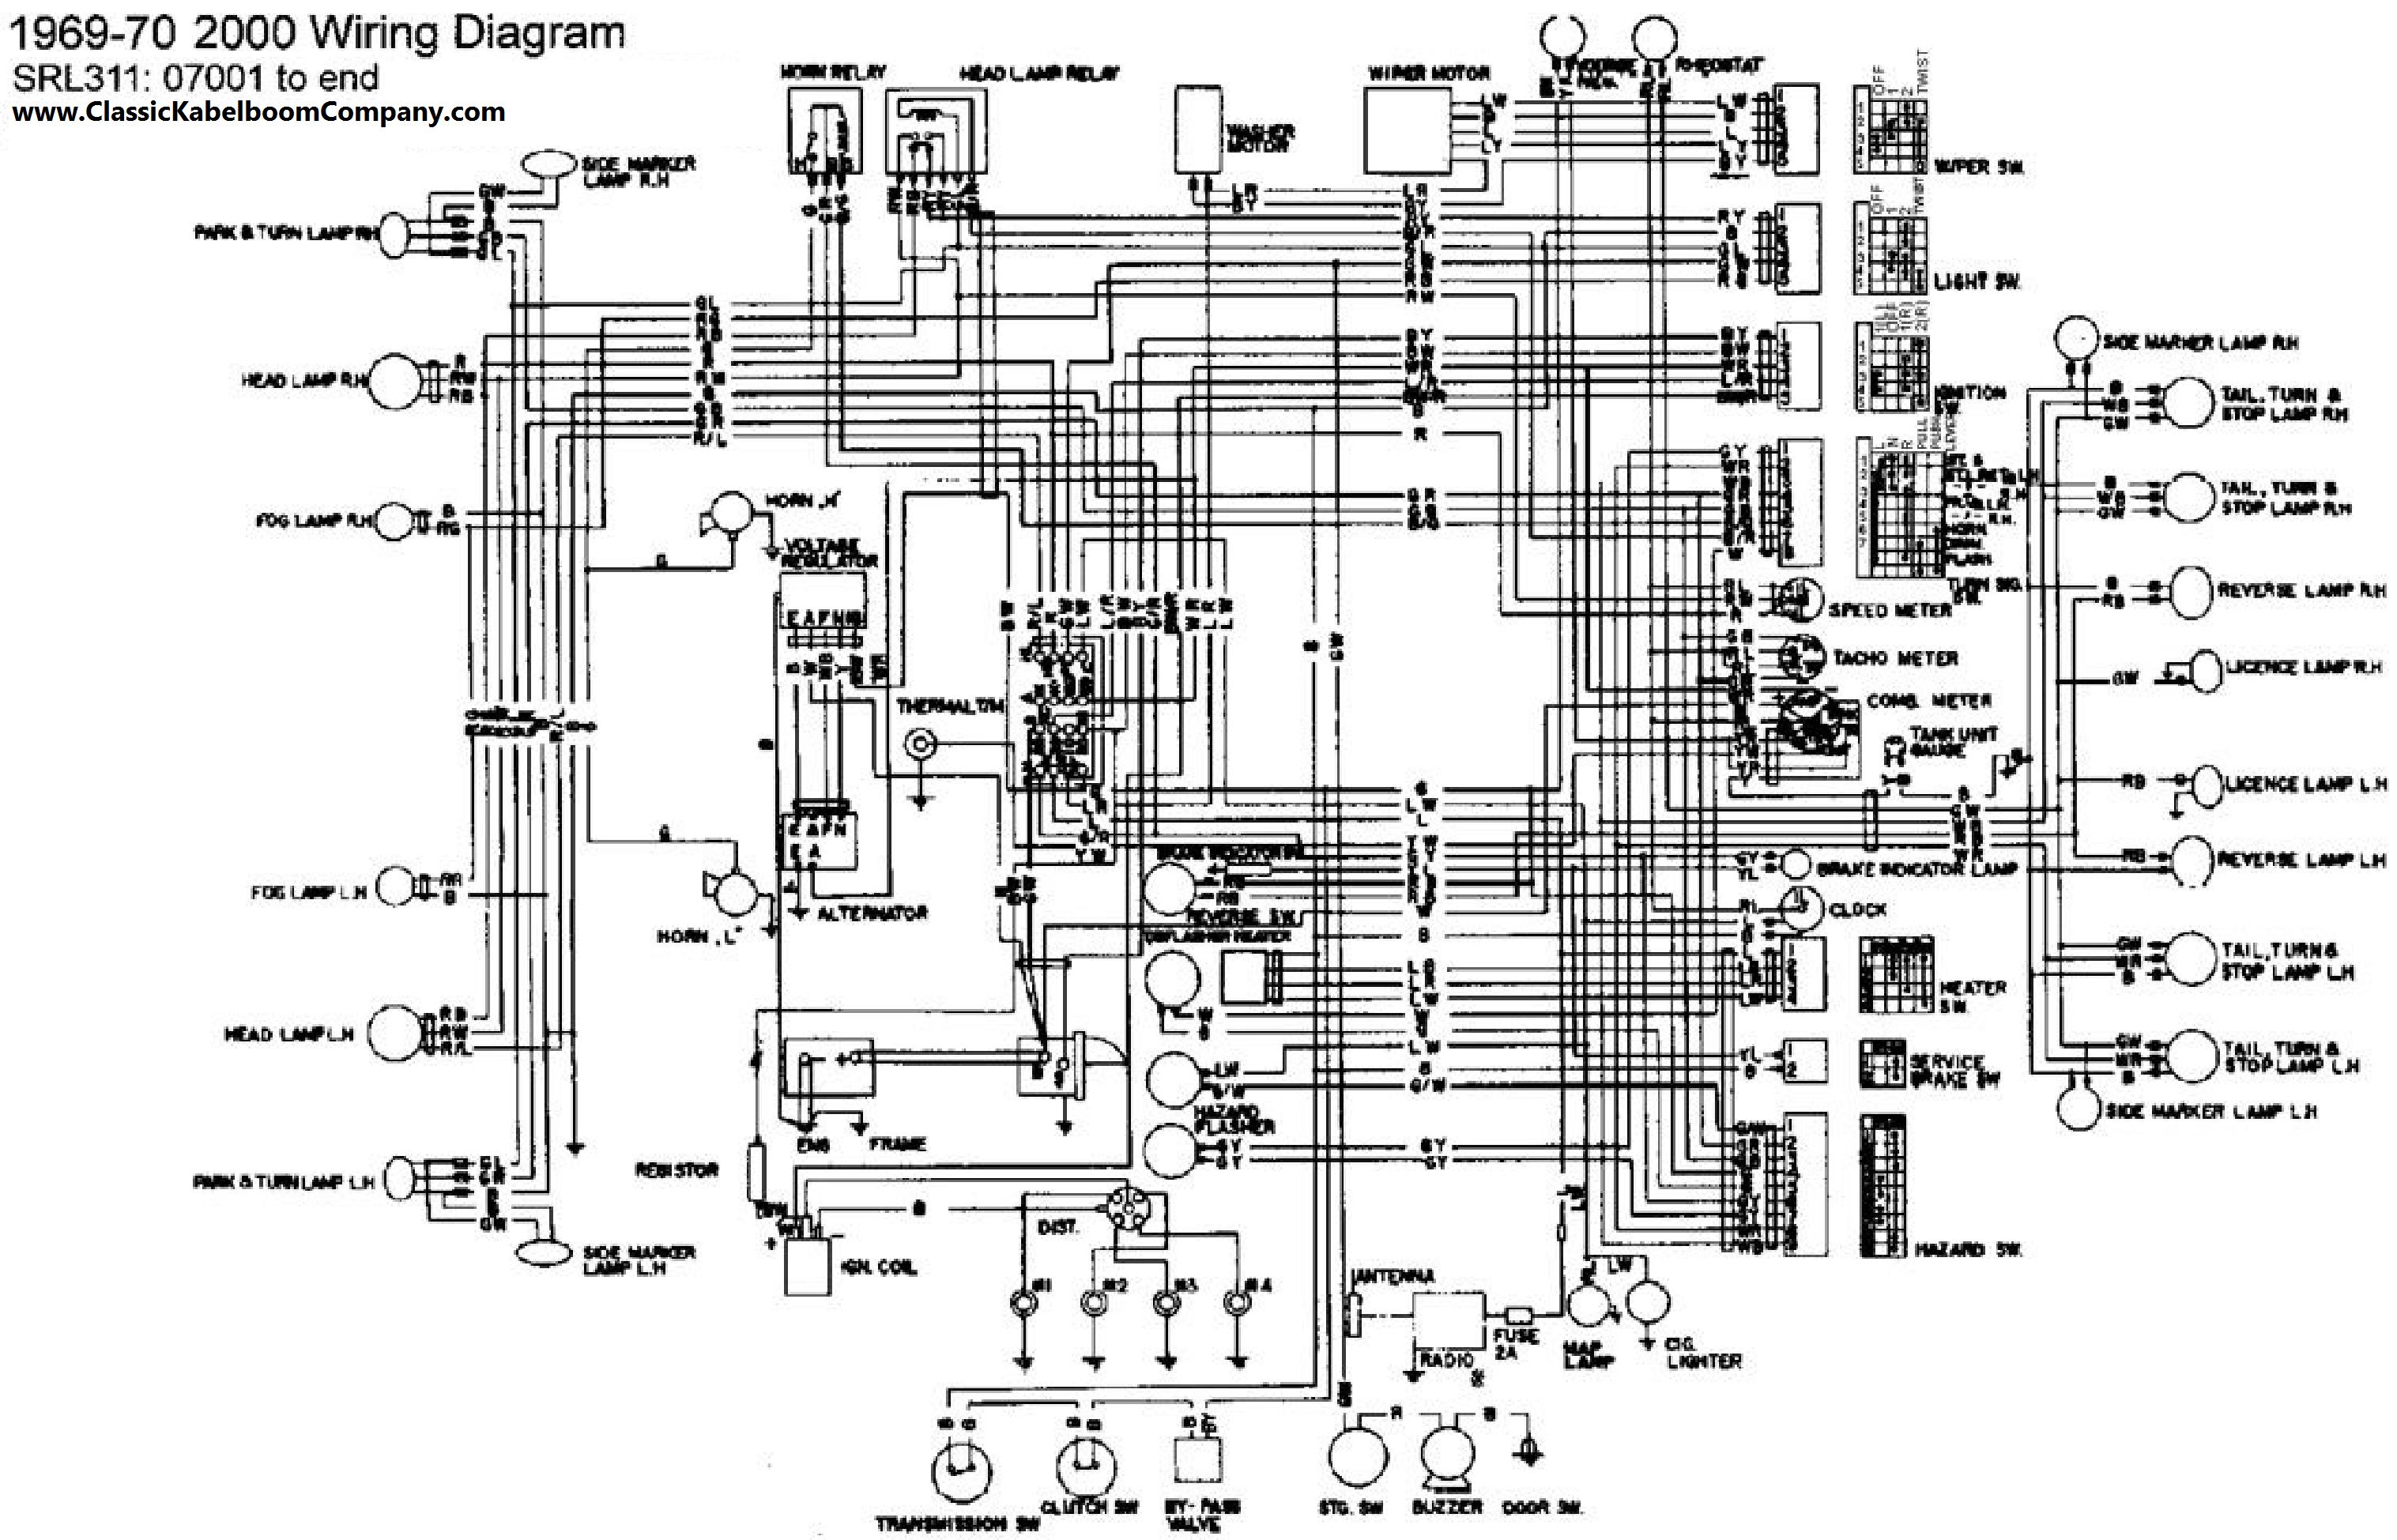 Amusing Massey Harris Wiring Diagrams Images - Best Image Schematics ...